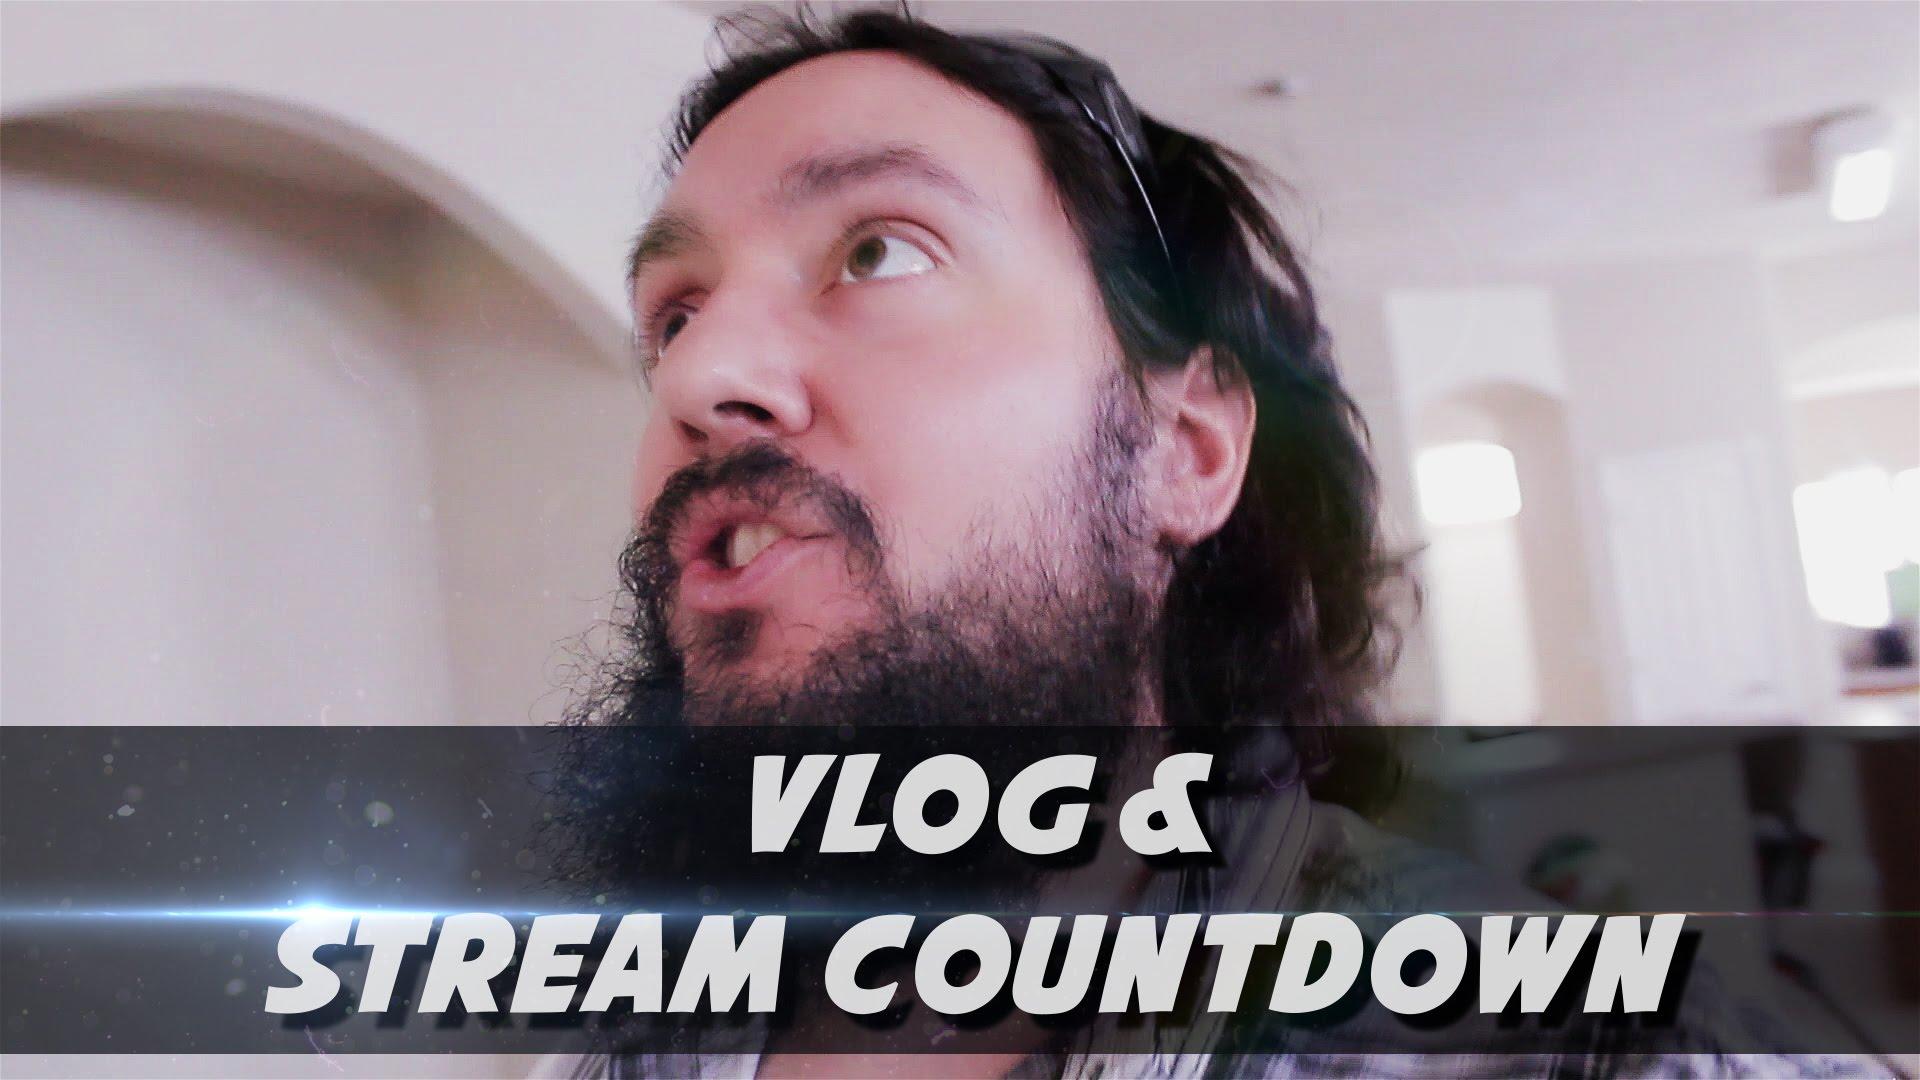 Vlog – Live stream Countdown – Psynaps mobile app – Legends update